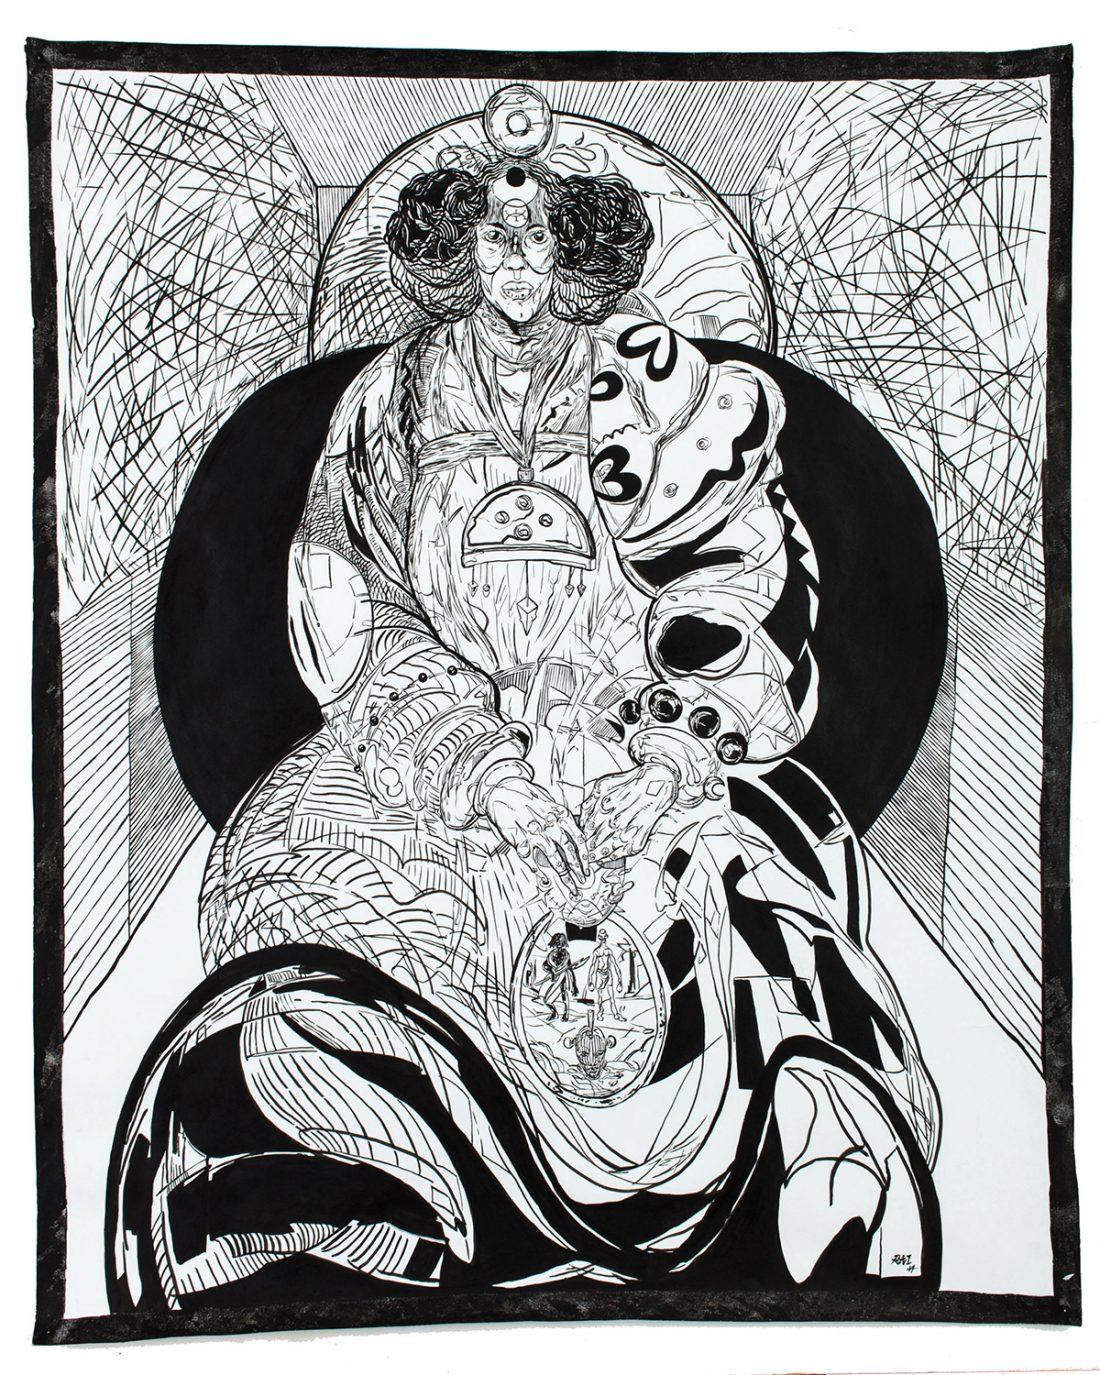 <p>Richard Ayodeji Ikhide, <em>IYA</em>, 2017, Acrylic ink on paper, 103 x 90 cm</p>